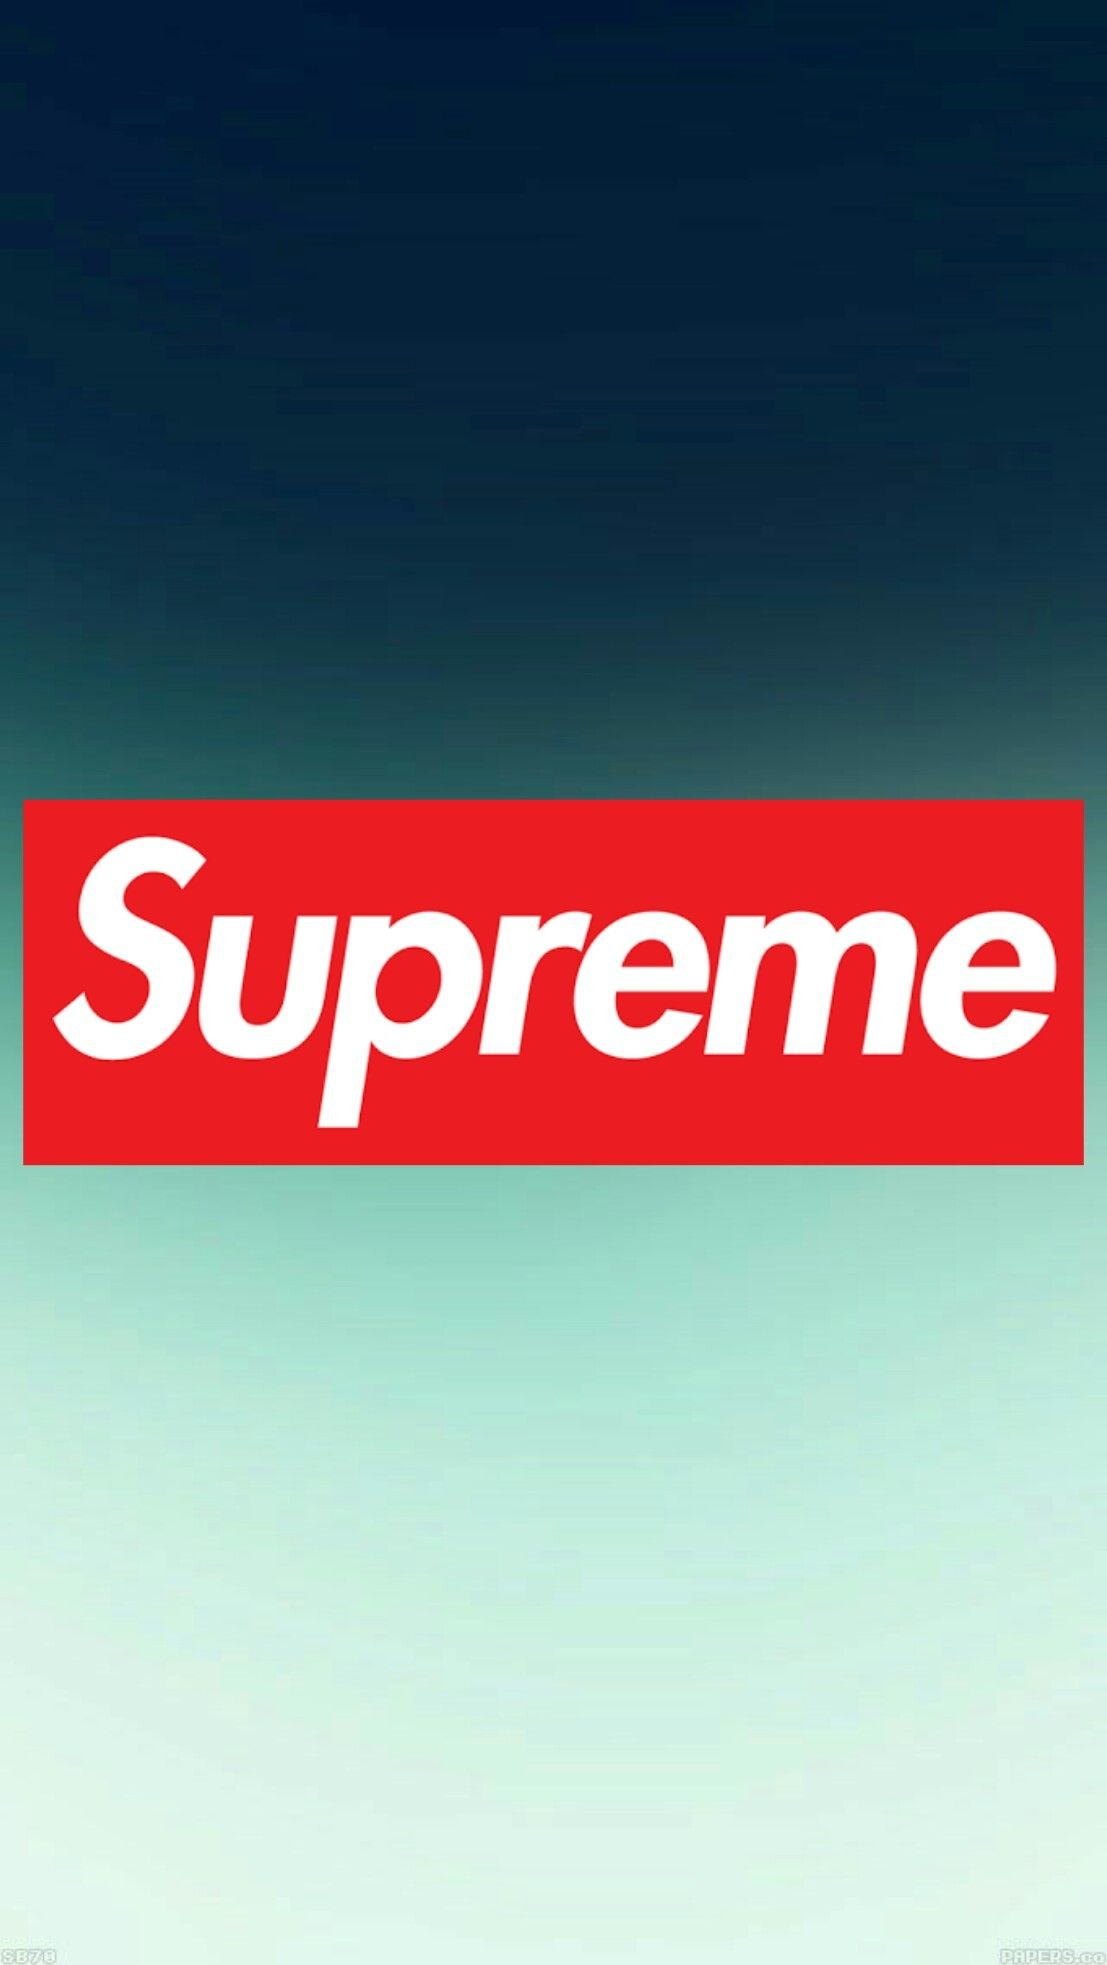 1107x1965, Best Supreme Wallpaper Hd Ideas On Pinterest - Supreme Wallpaper Hd - HD Wallpaper